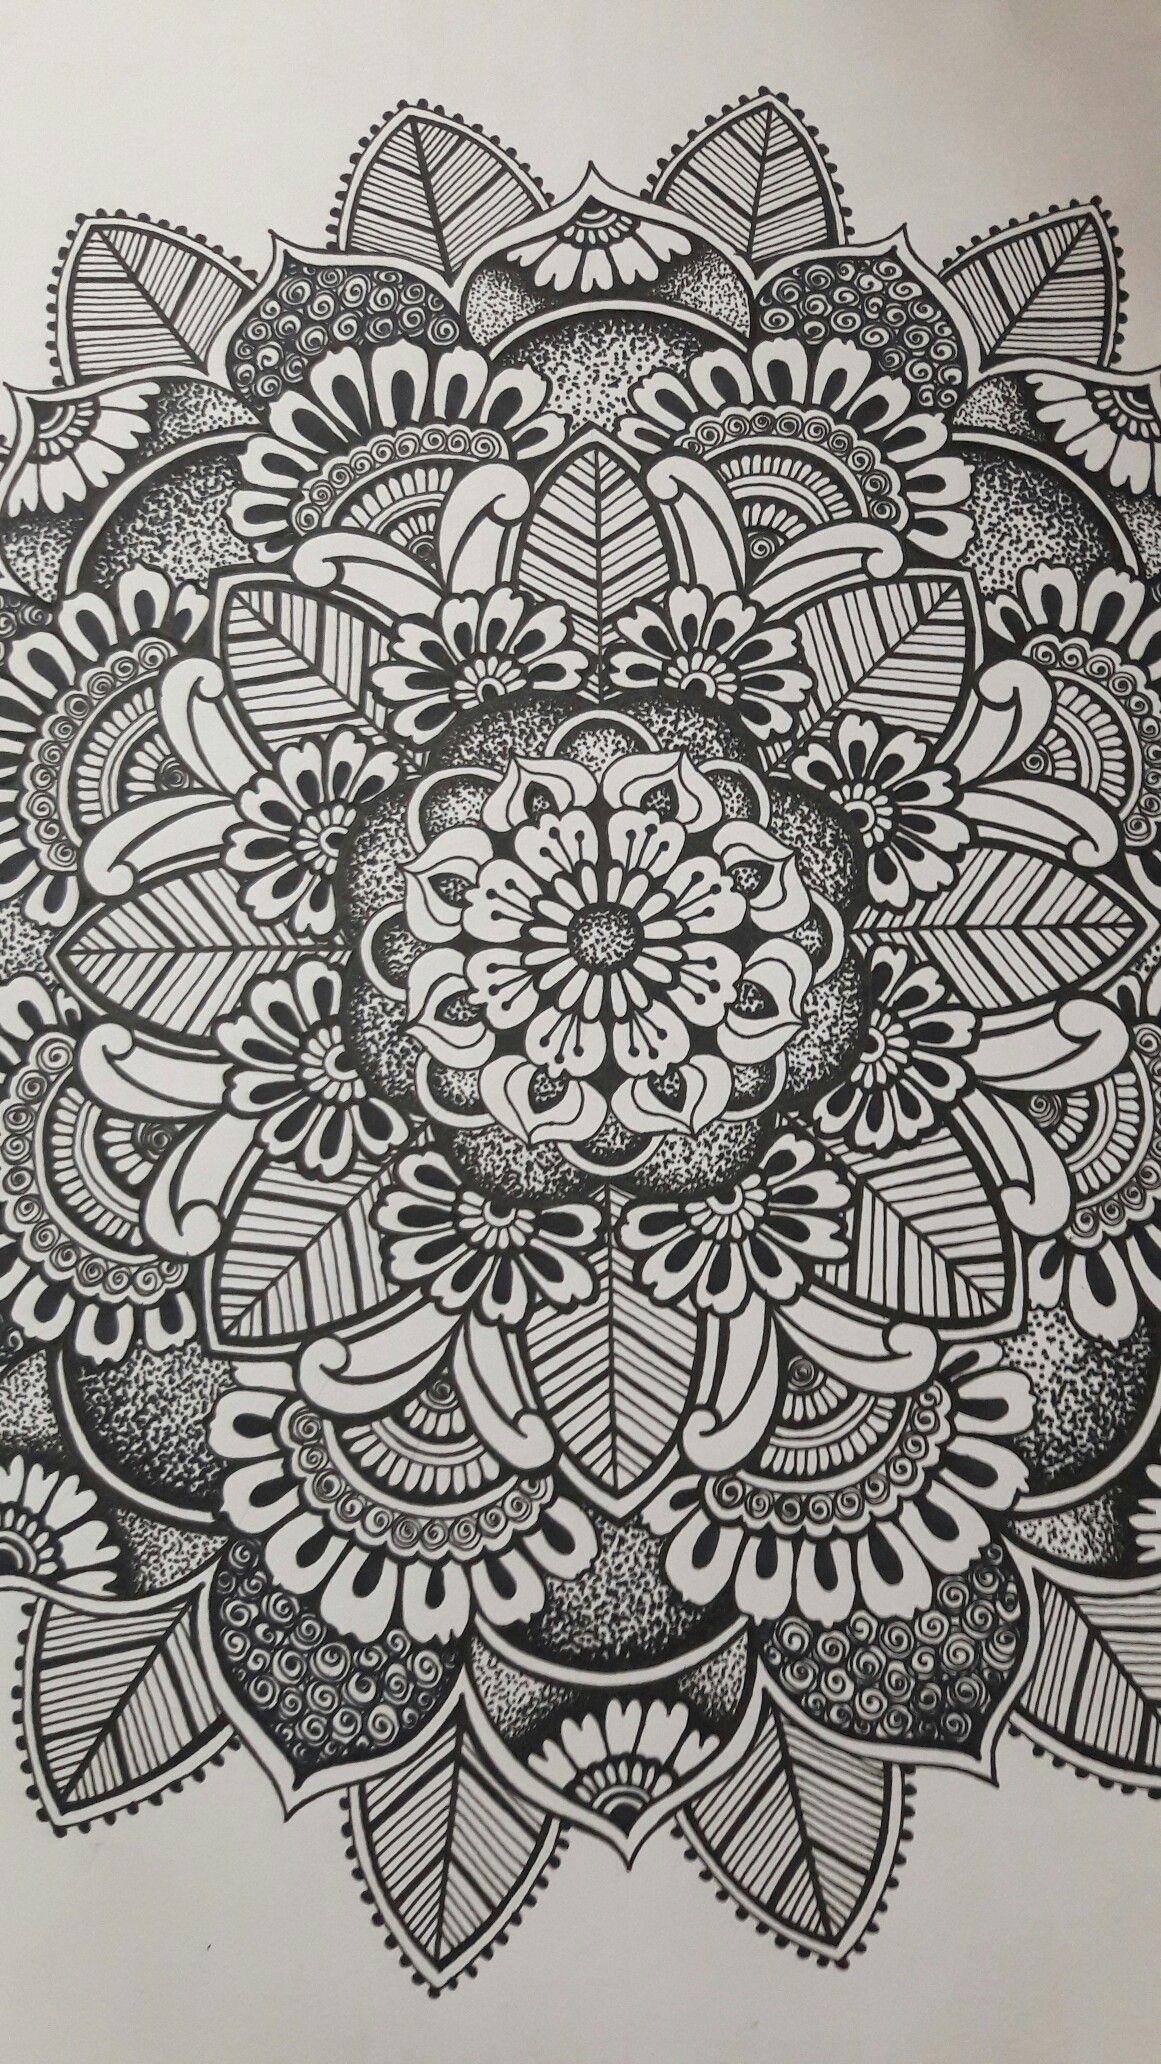 #mandala#black-and-white #zen#circle